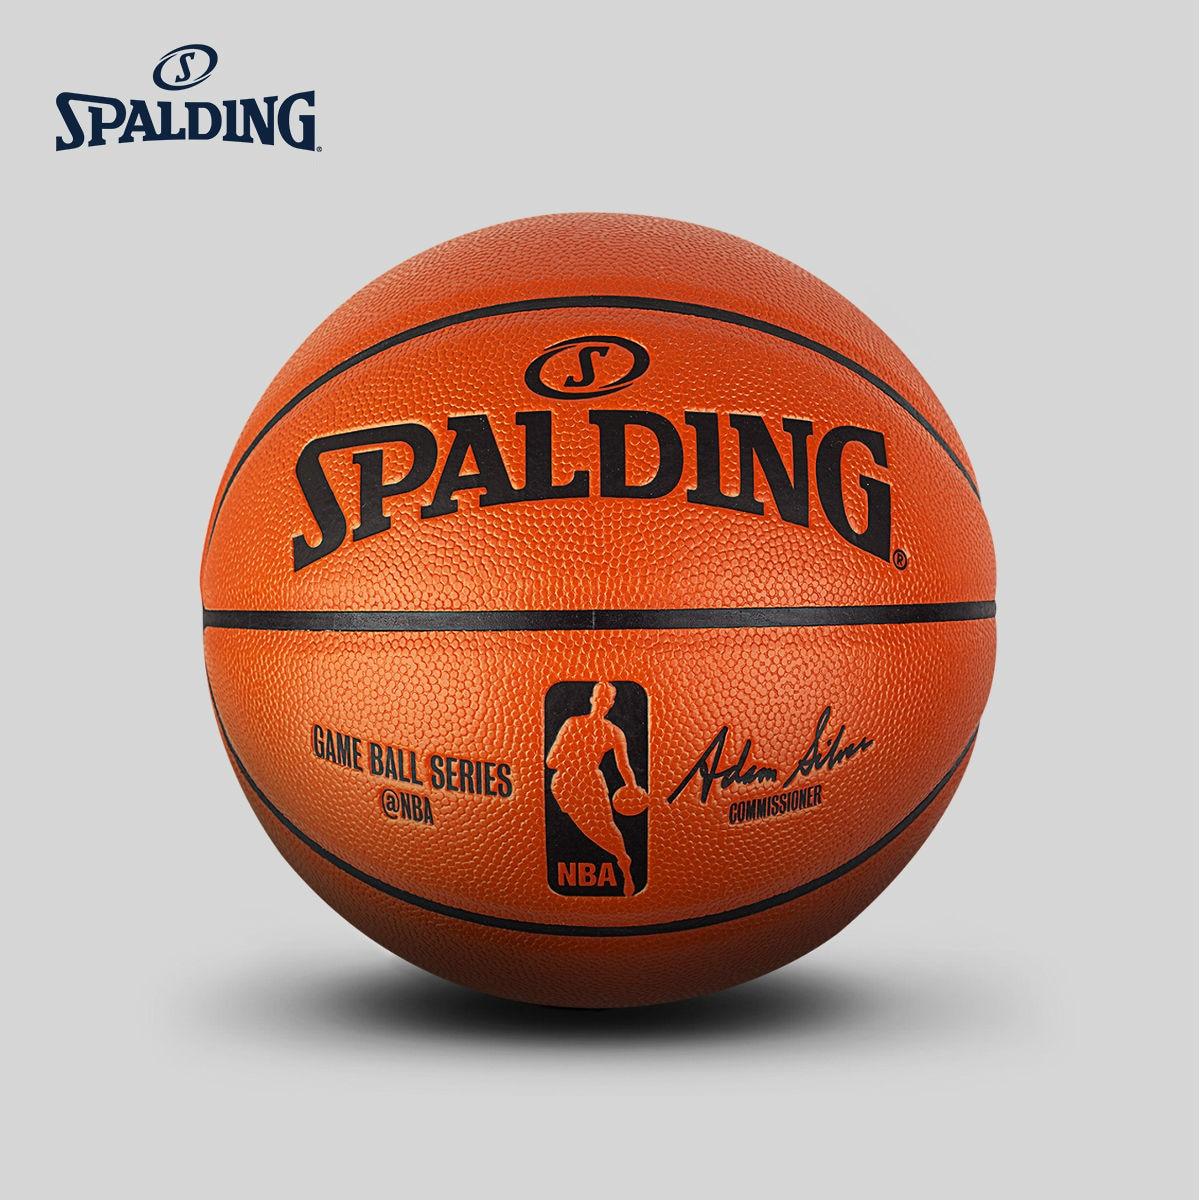 Auténtico balón de Baloncesto estándar Spalding Nba, n. ° 7, pelota de Baloncesto para hombre, 74-570y Baloncesto